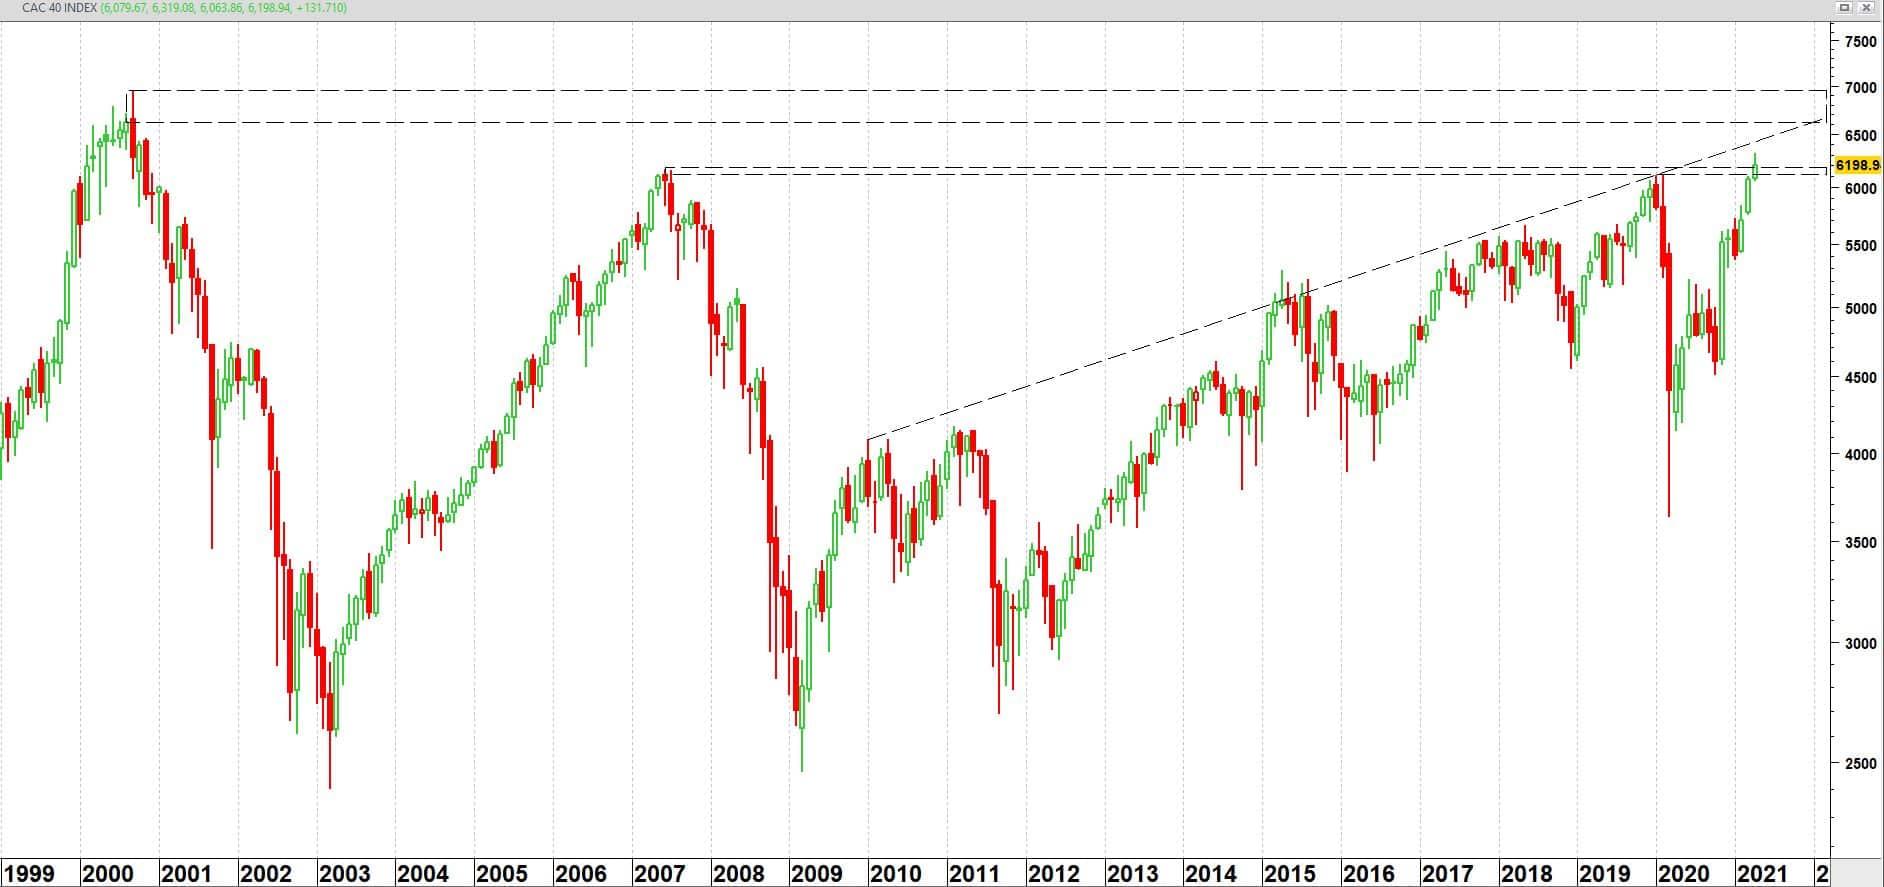 Monatliche CAC-40-Rate ab 1999 (logarithmische Skala)